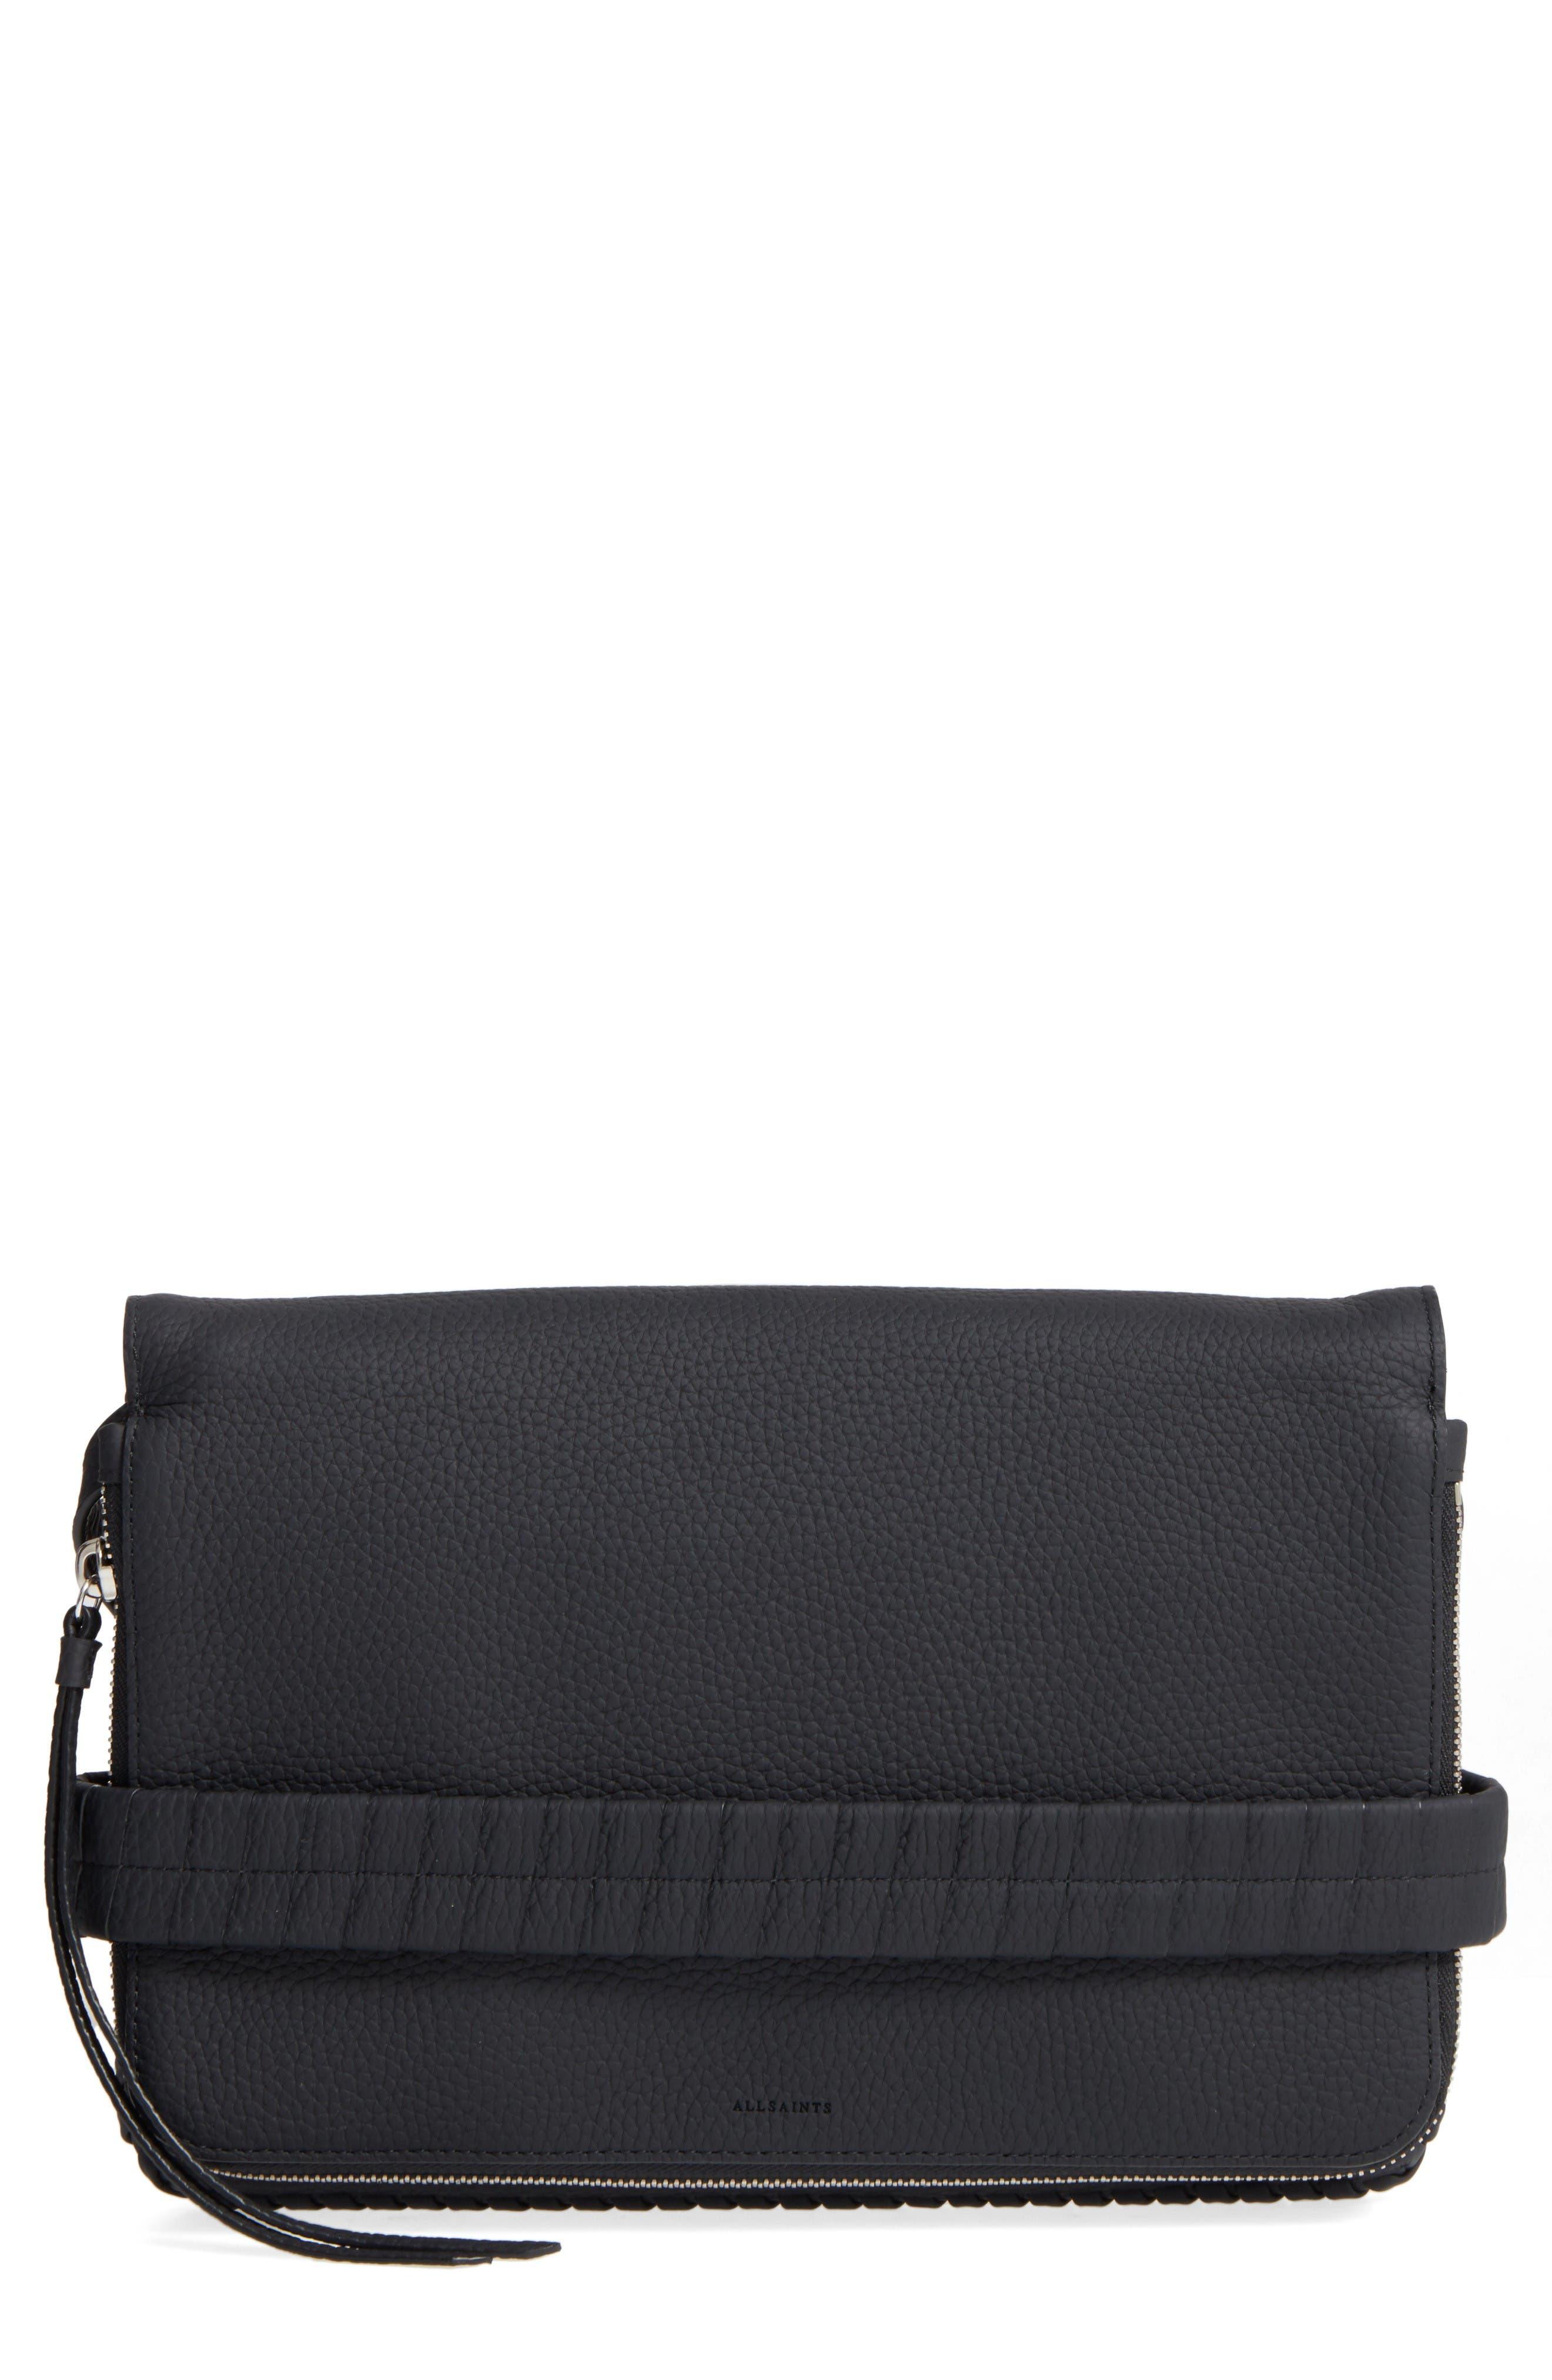 Main Image - ALLSAINTS Medium Club Convertible Crossbody Bag